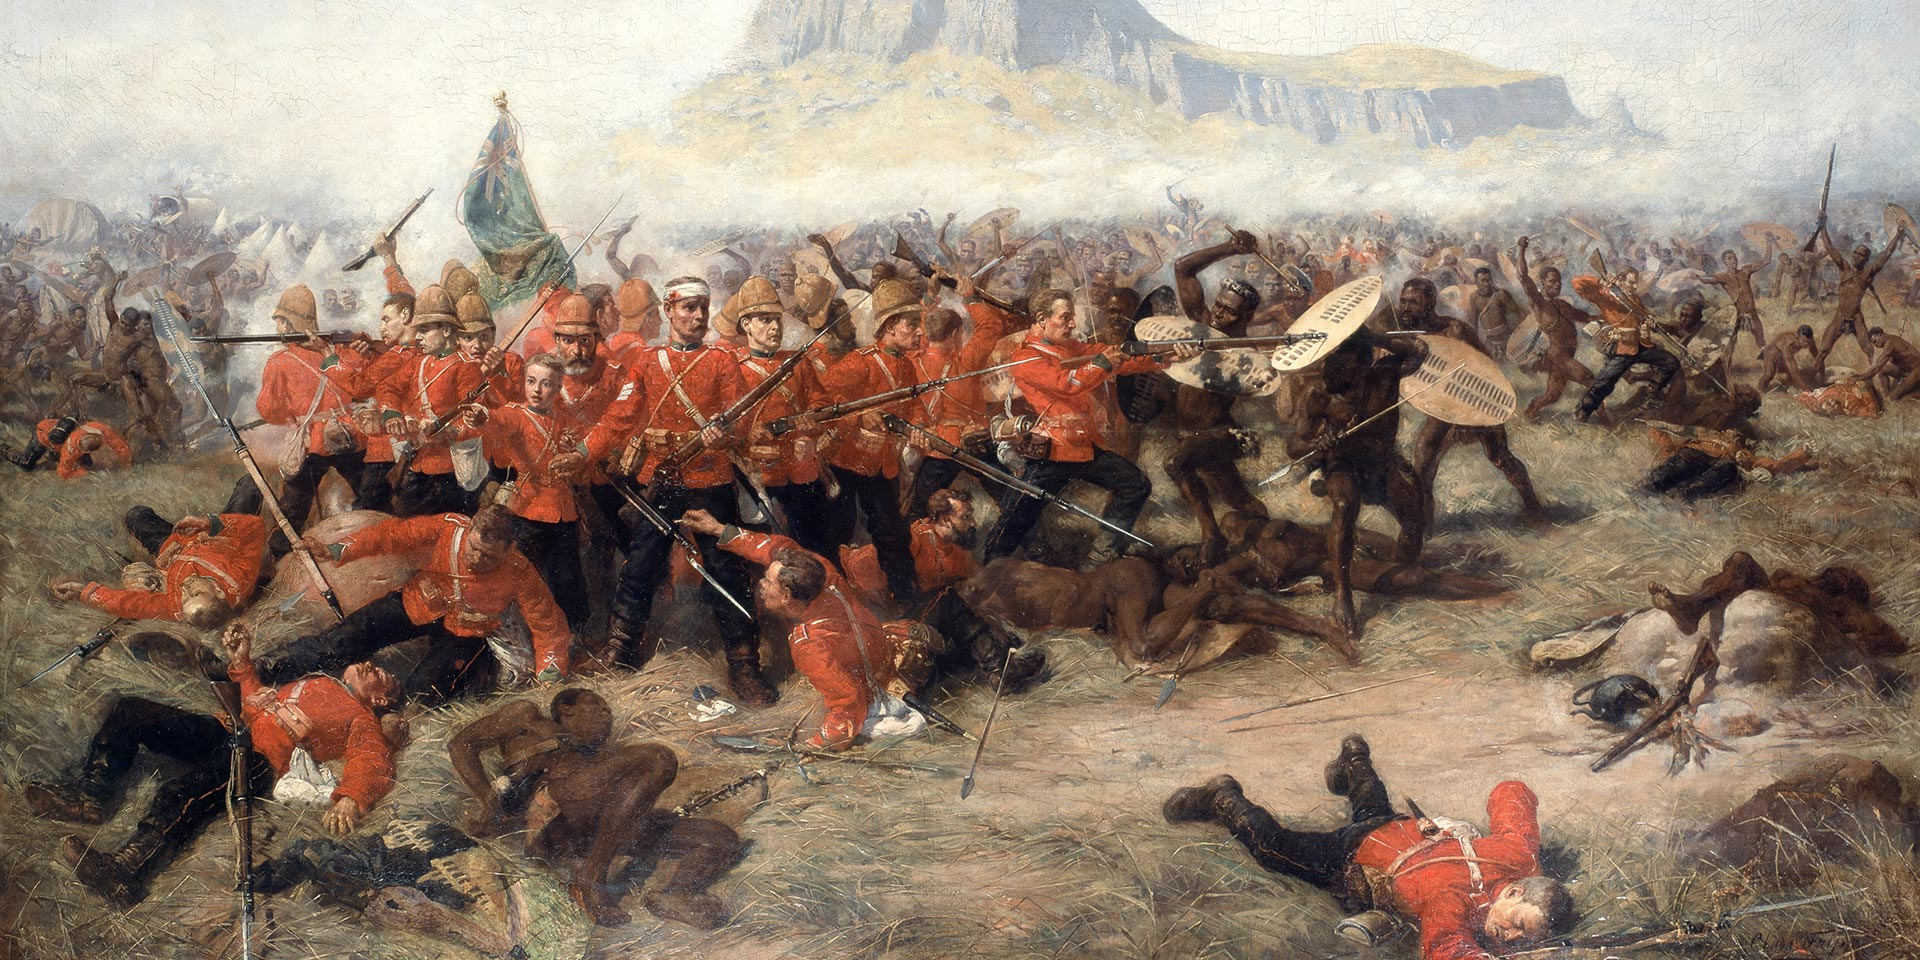 'The Battle of Isandlwana',by Charles Edwin Fripp, c1885